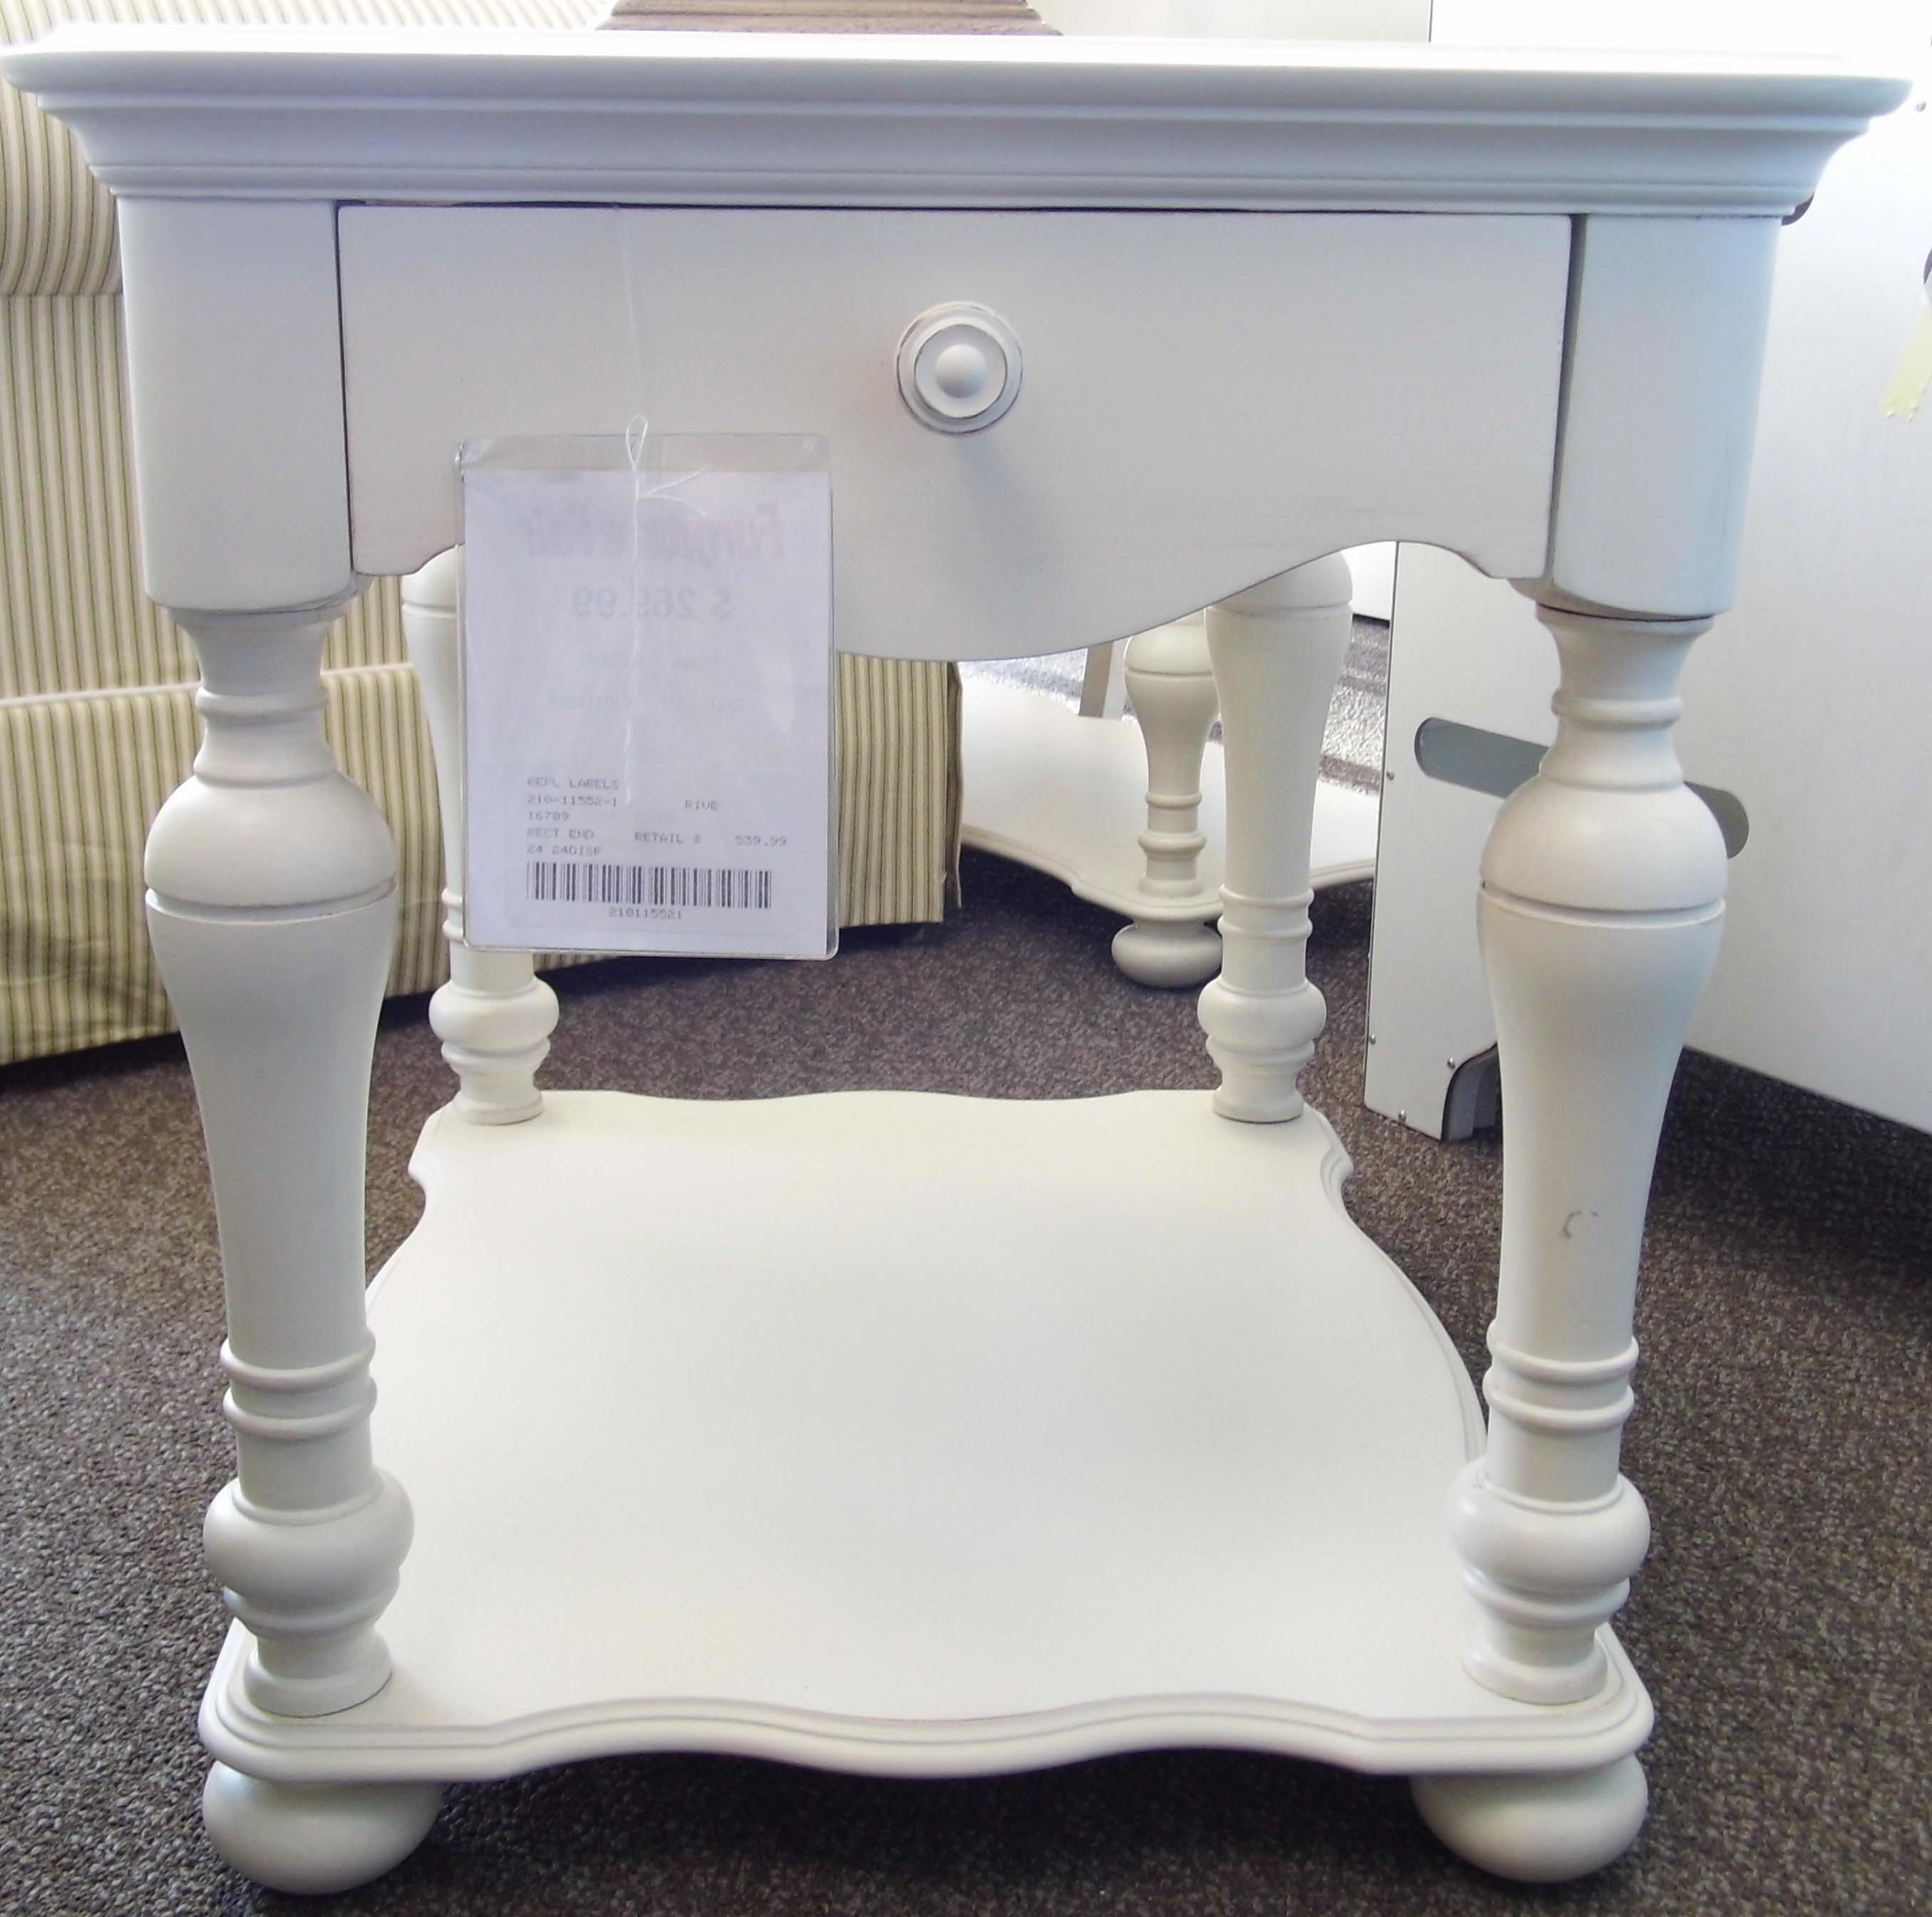 Placid Cove 16709 by Riverside Furniture at Furniture Fair - North Carolina